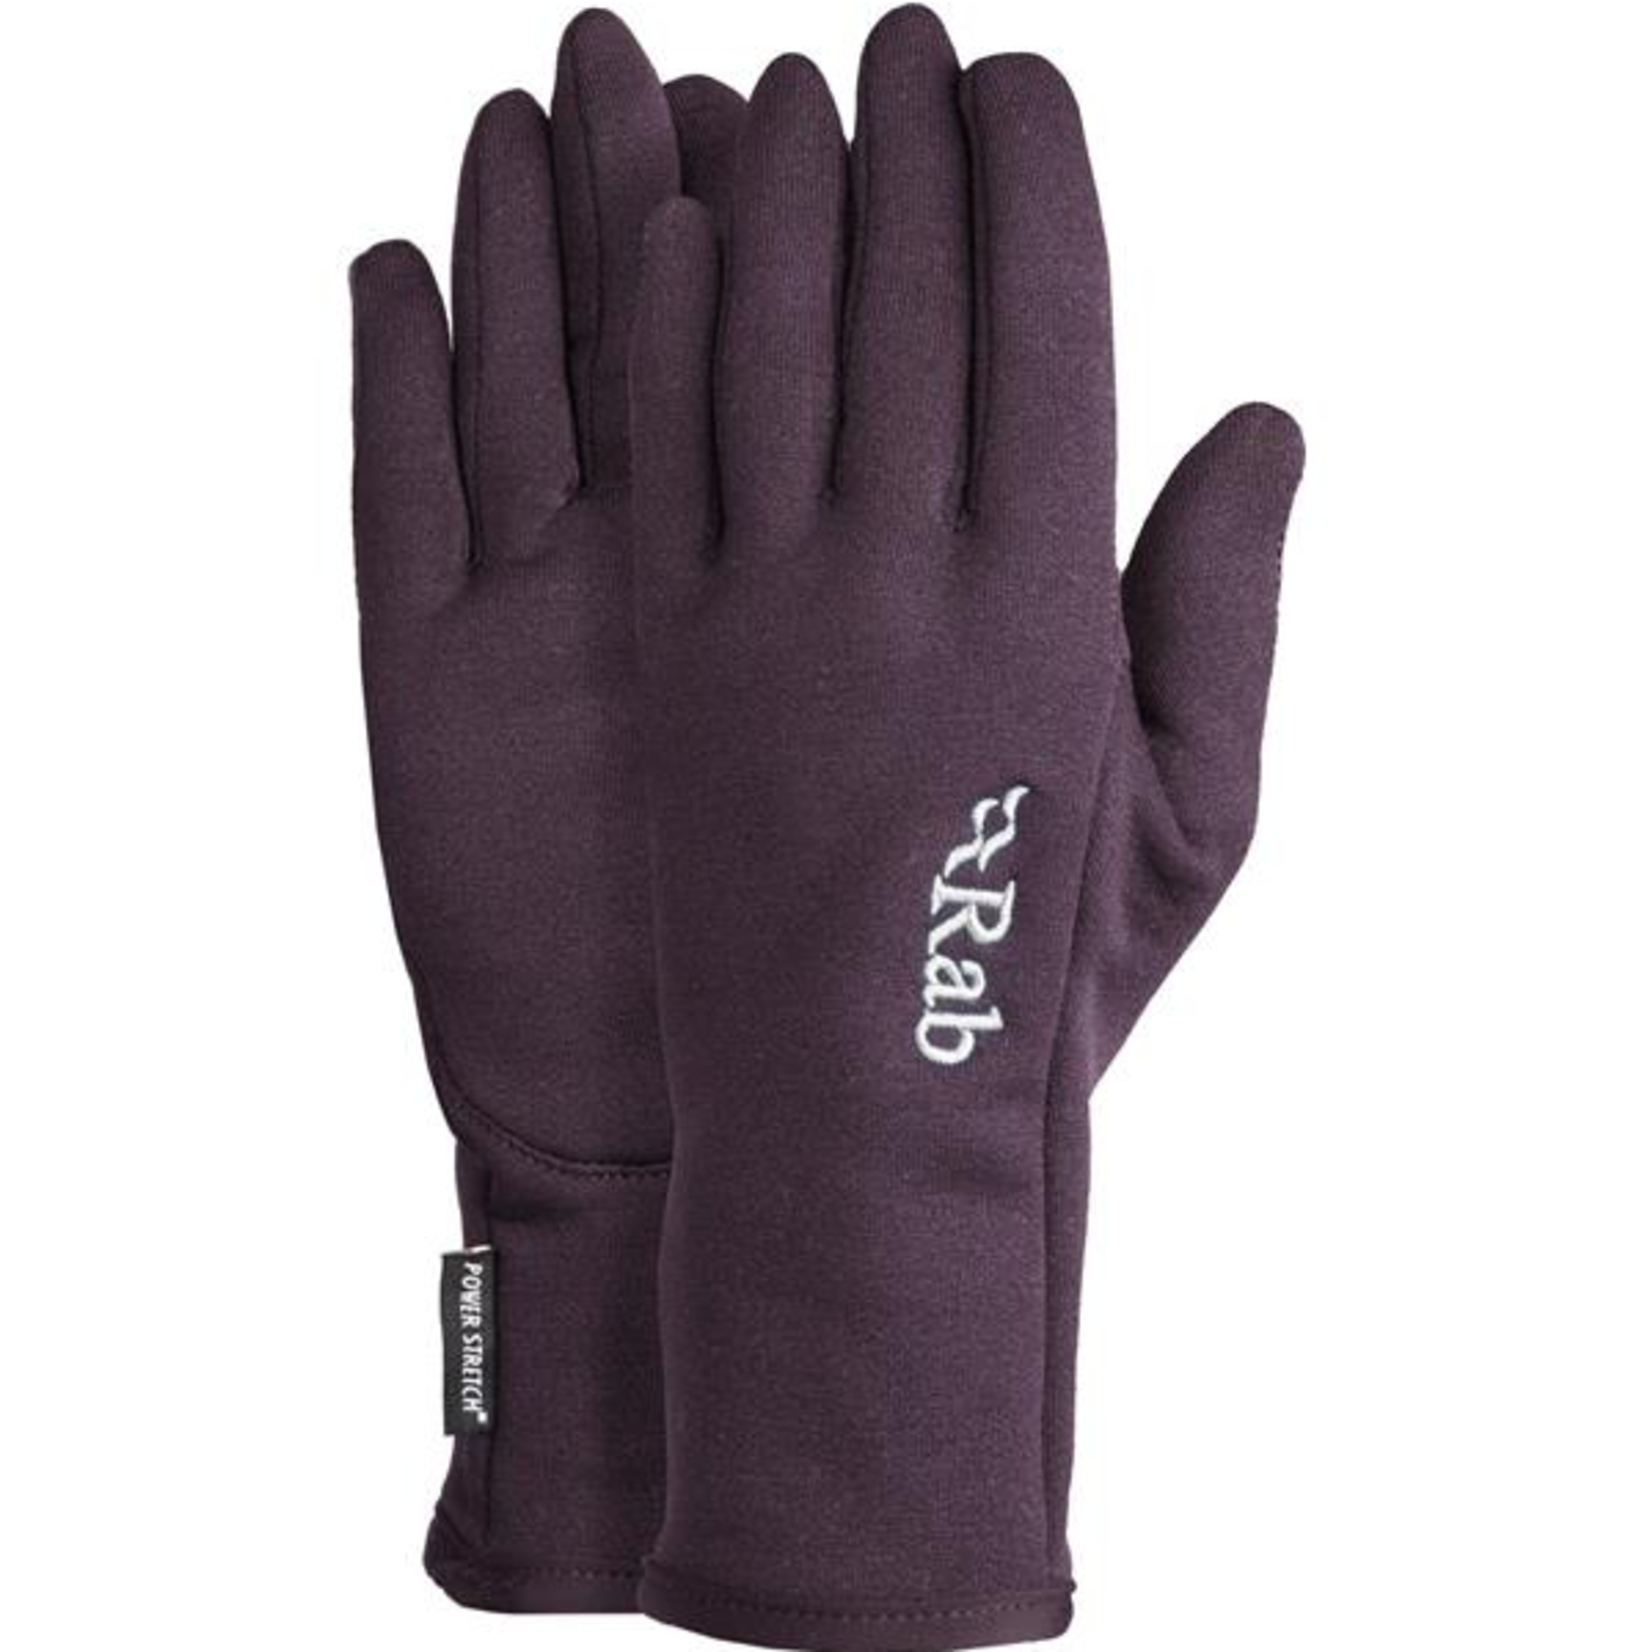 RAB Power Stretch Pro Gloves Wmns